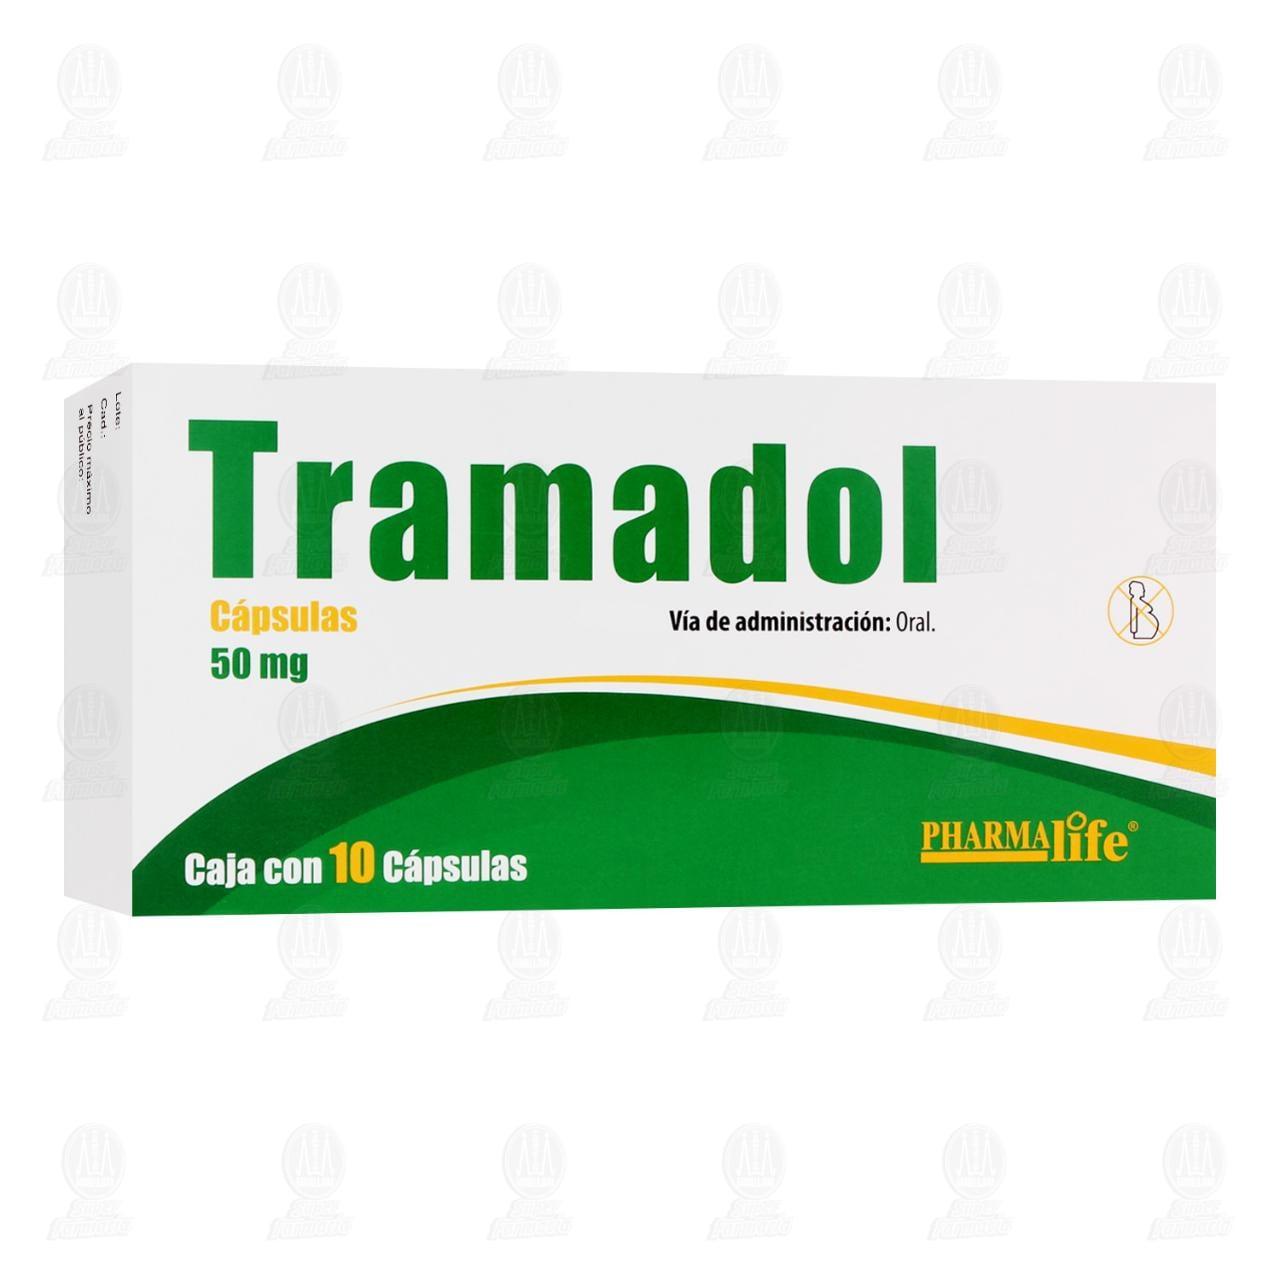 Comprar Tramadol 50mg 10 Cápsulas Pharmalife en Farmacias Guadalajara